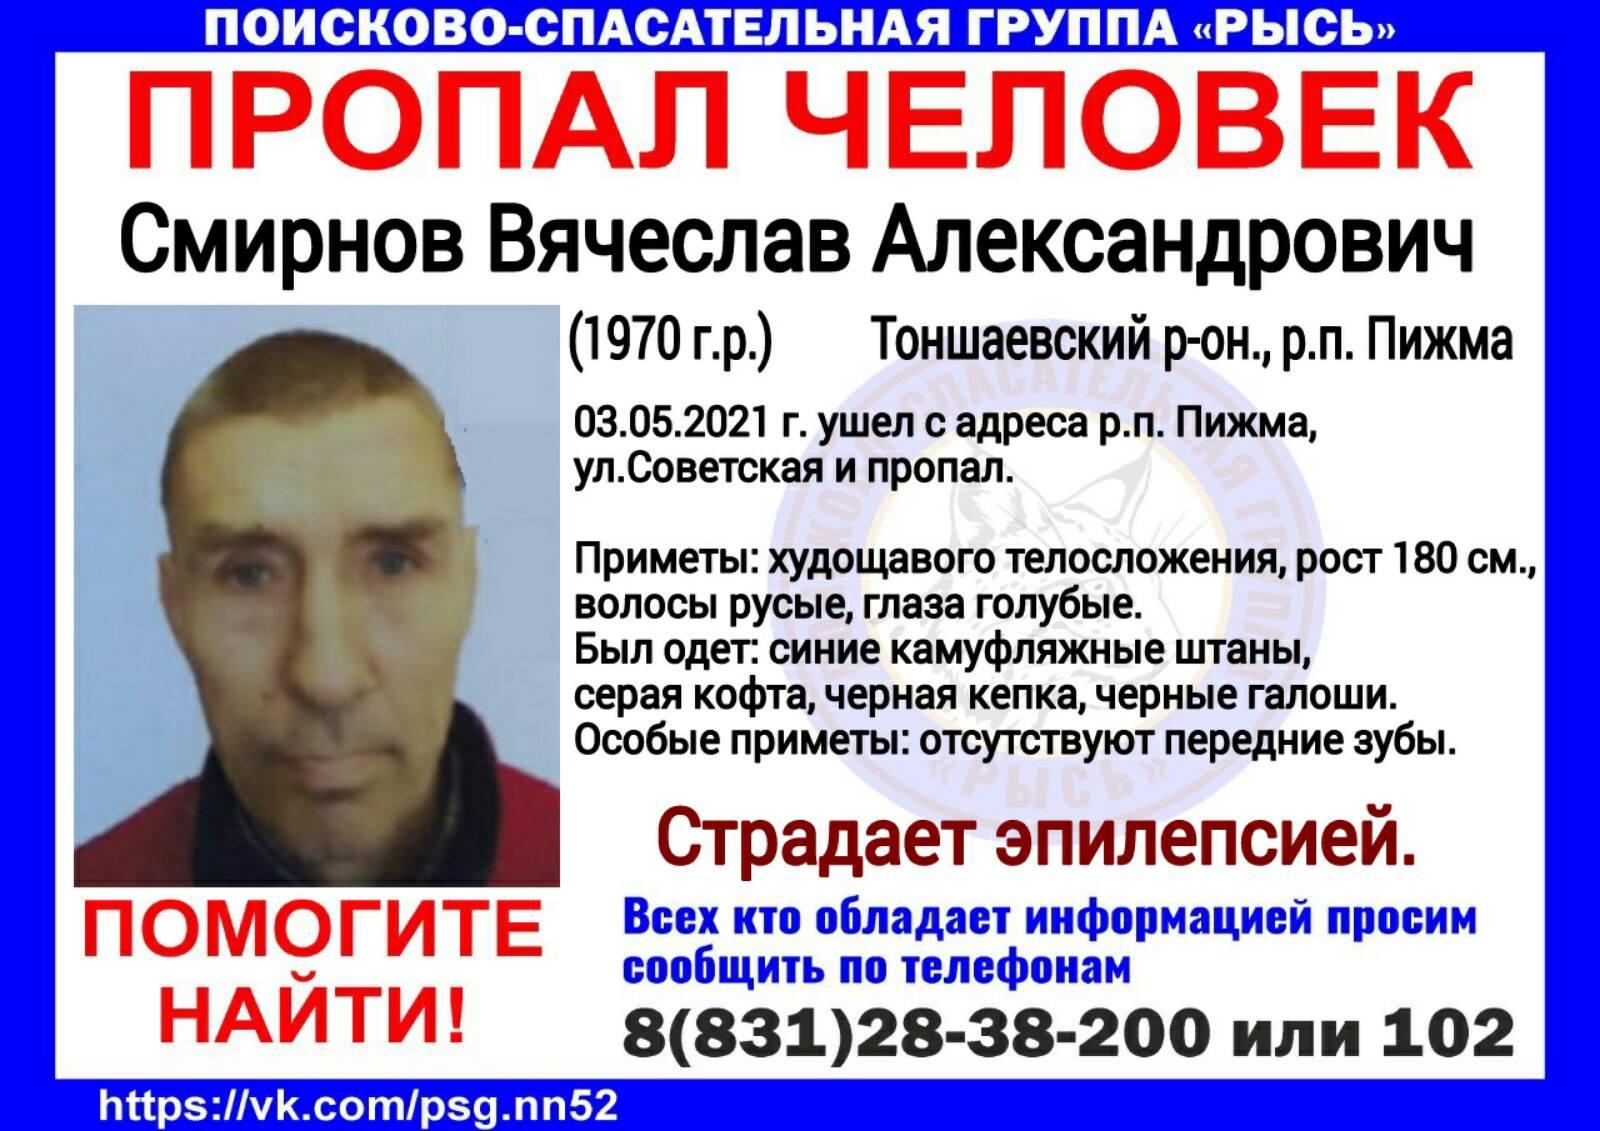 Смирнов Вячеслав Александрович